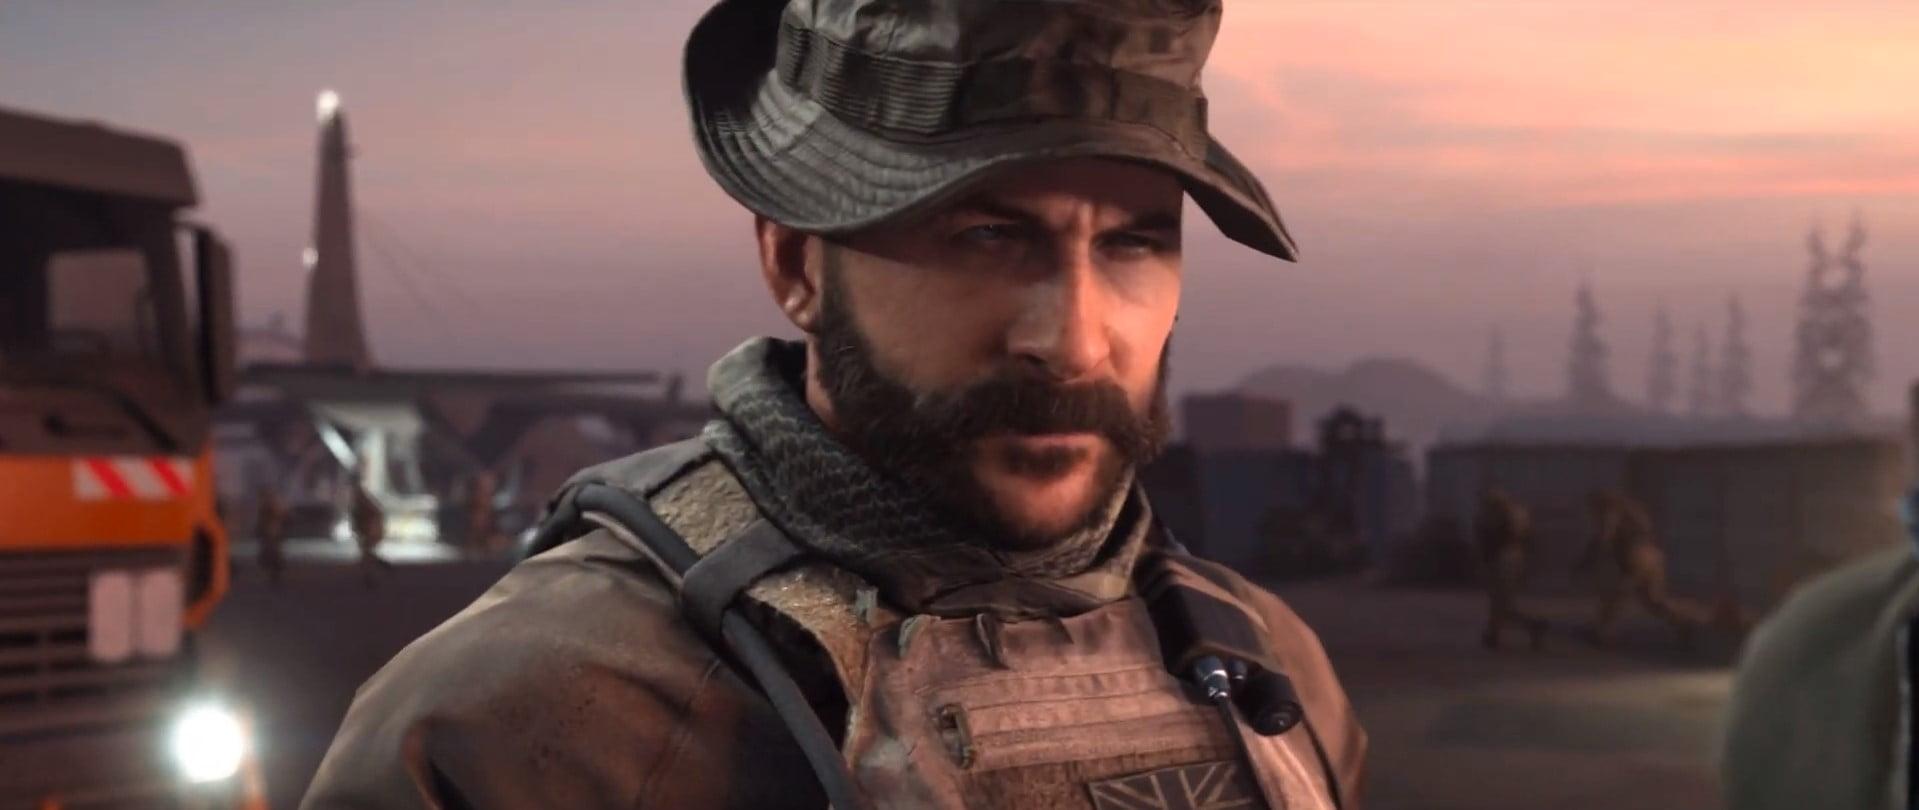 Call of Duty: Modern Warfare, Донецьк